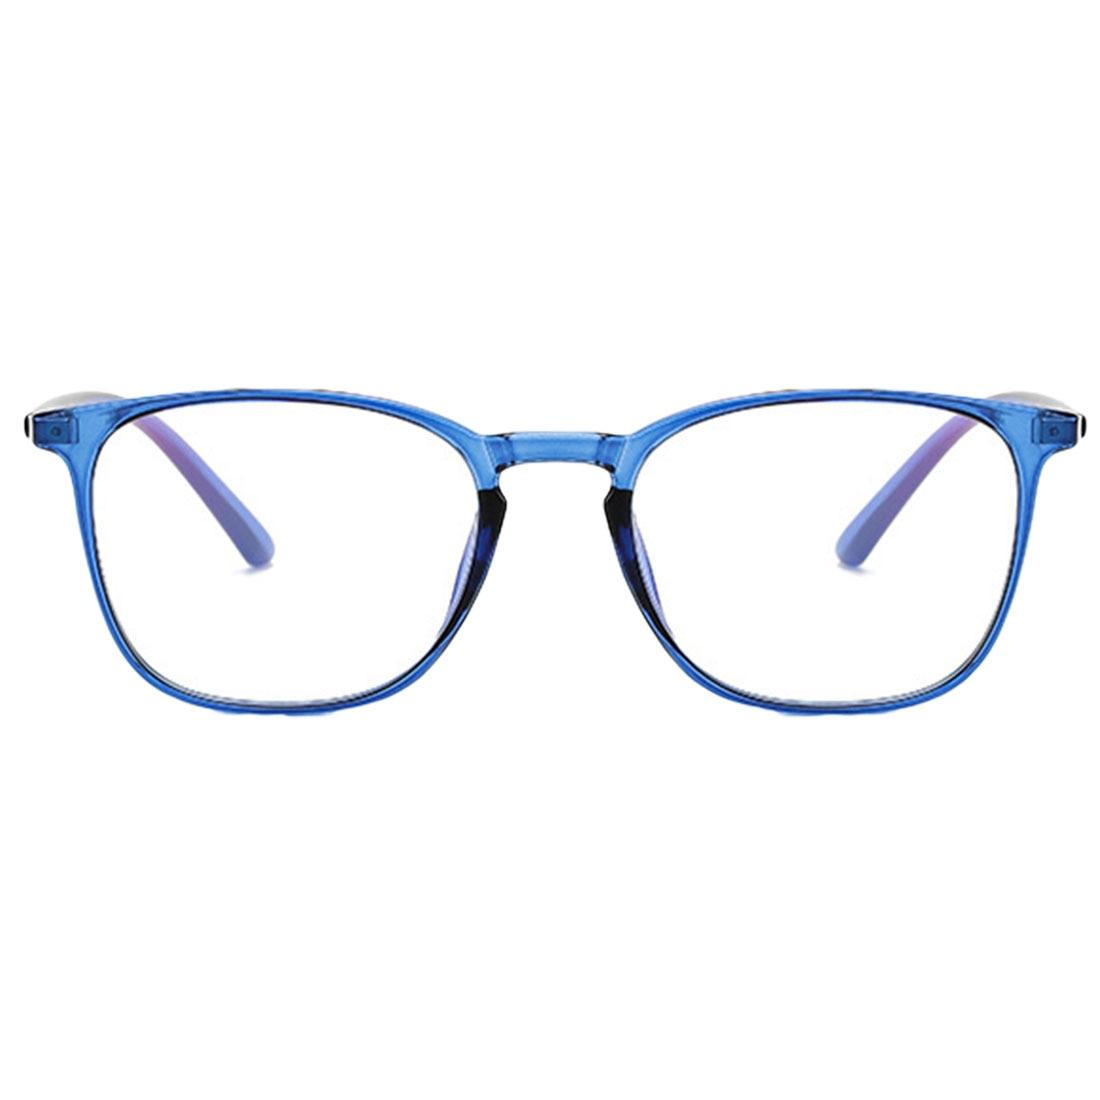 Blue Light Glasses Frame Men Ultralight Square Myopia Prescription Eyeglasses Metal Full Optical Frame Screwless Eyewear in Men 39 s Eyewear Frames from Apparel Accessories